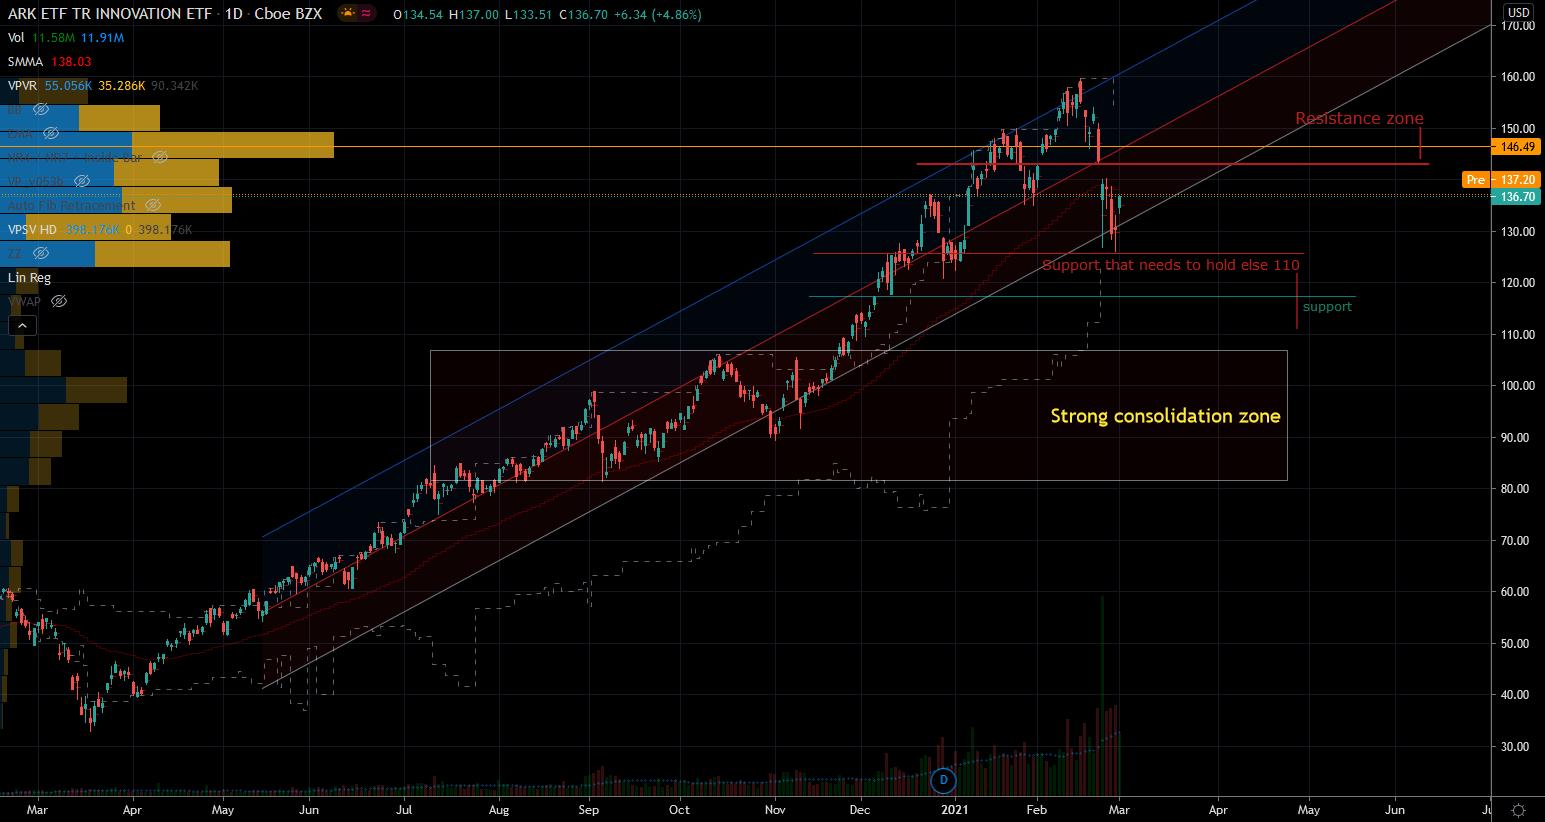 ARKK Stock Chart Showing Success Story